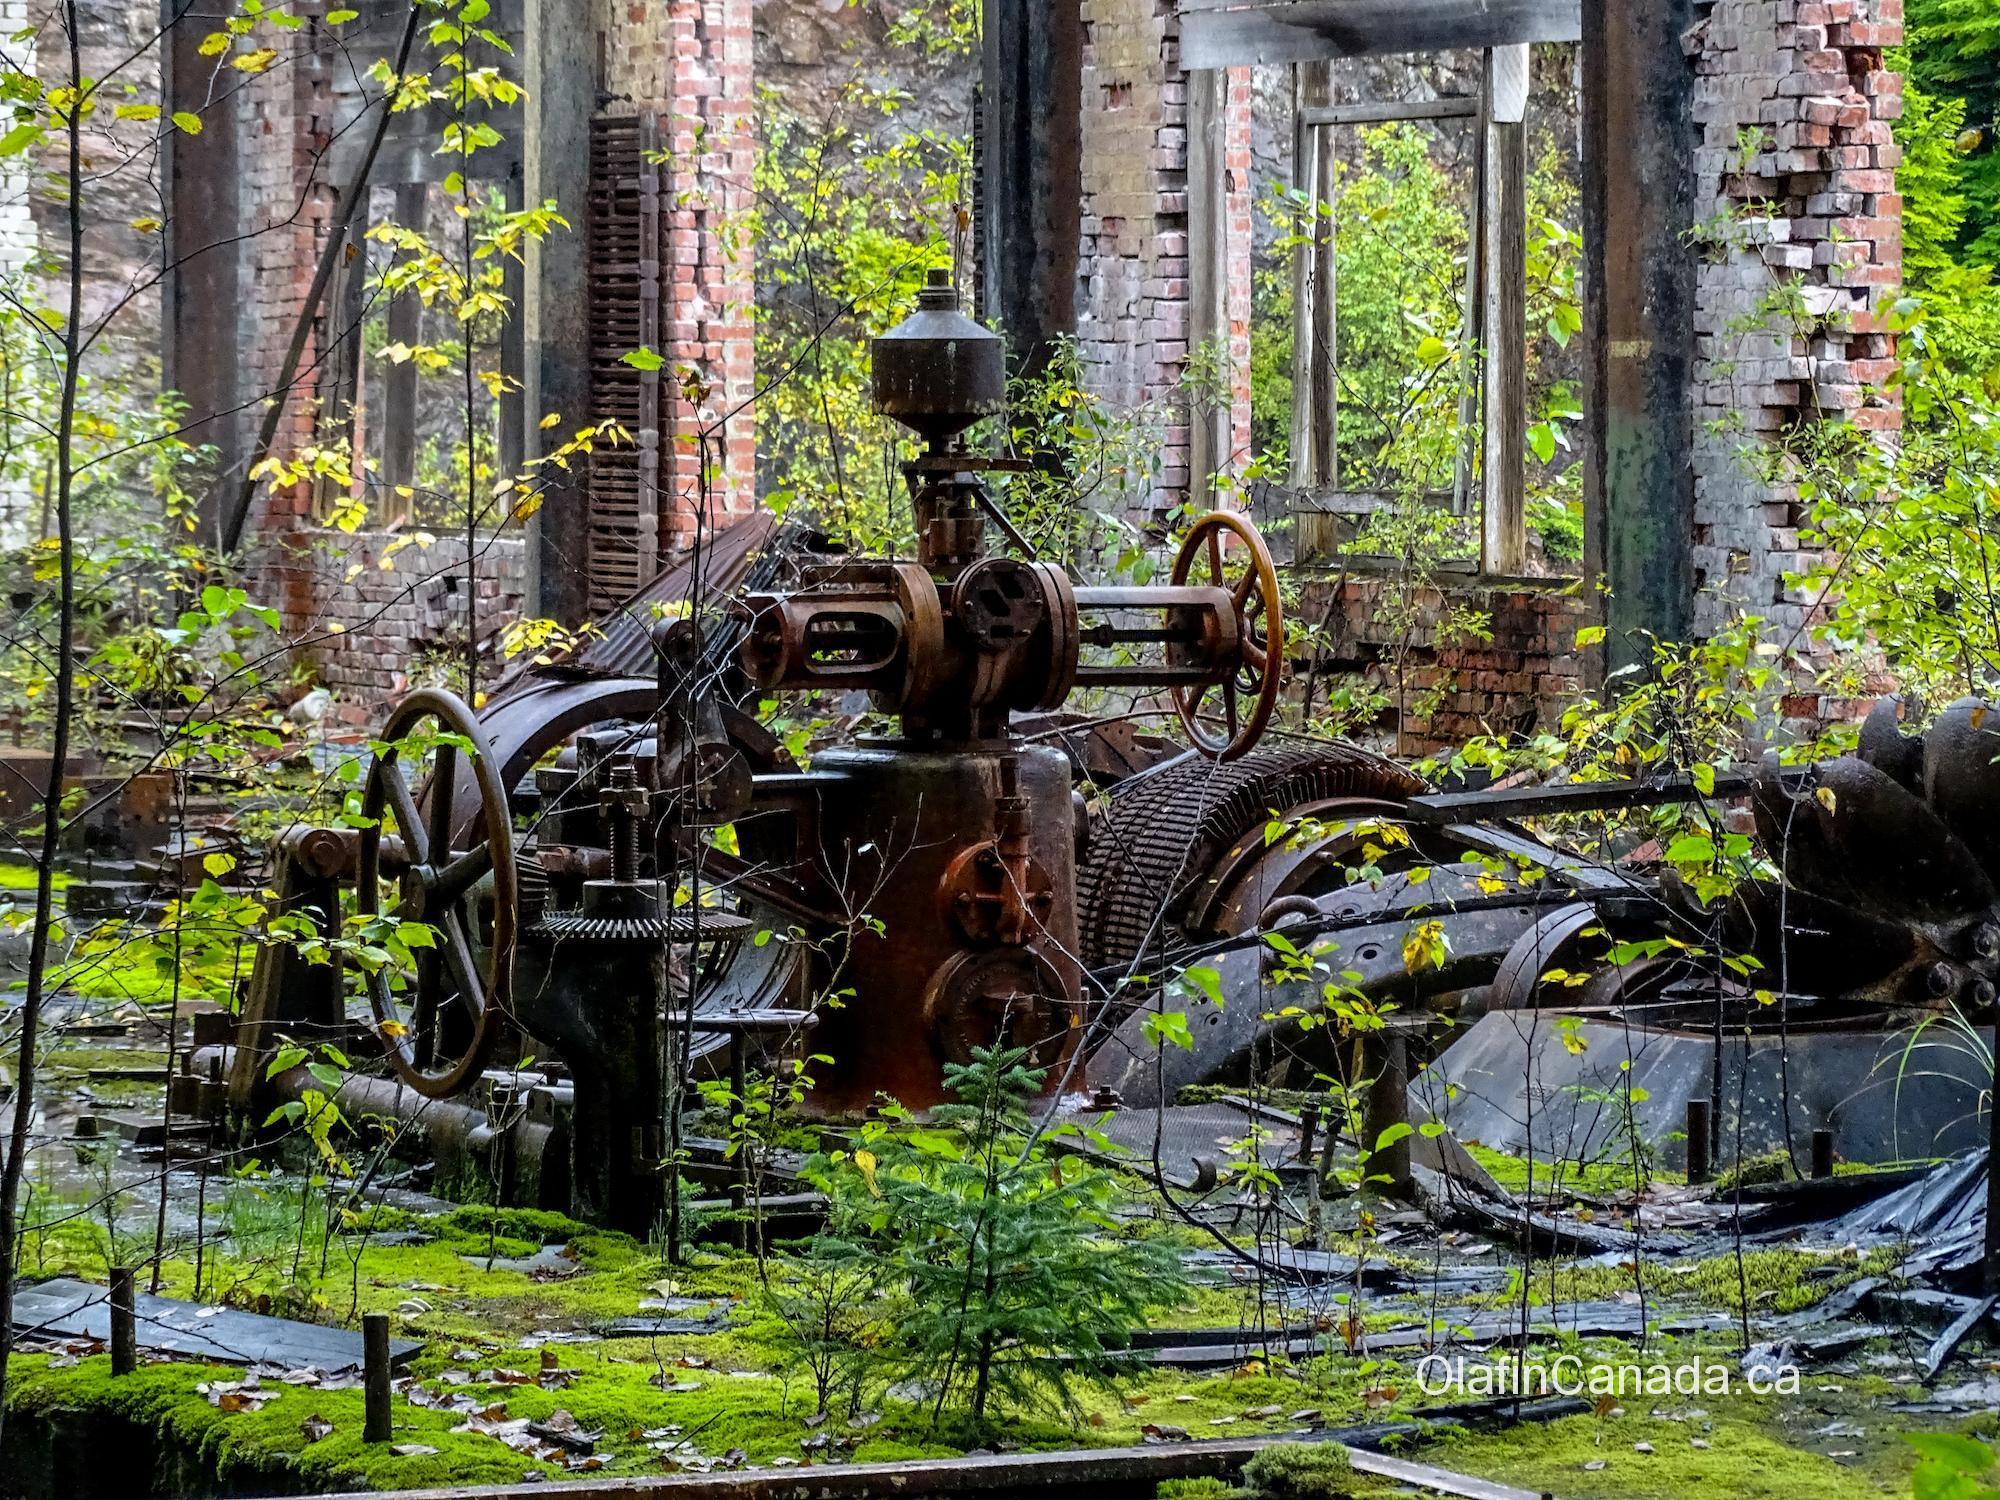 Turbine in powerhouse No. 1 in Anyox #olafincanada #britishcolumbia #discoverbc #abandonedbc #anyox #powerhouse